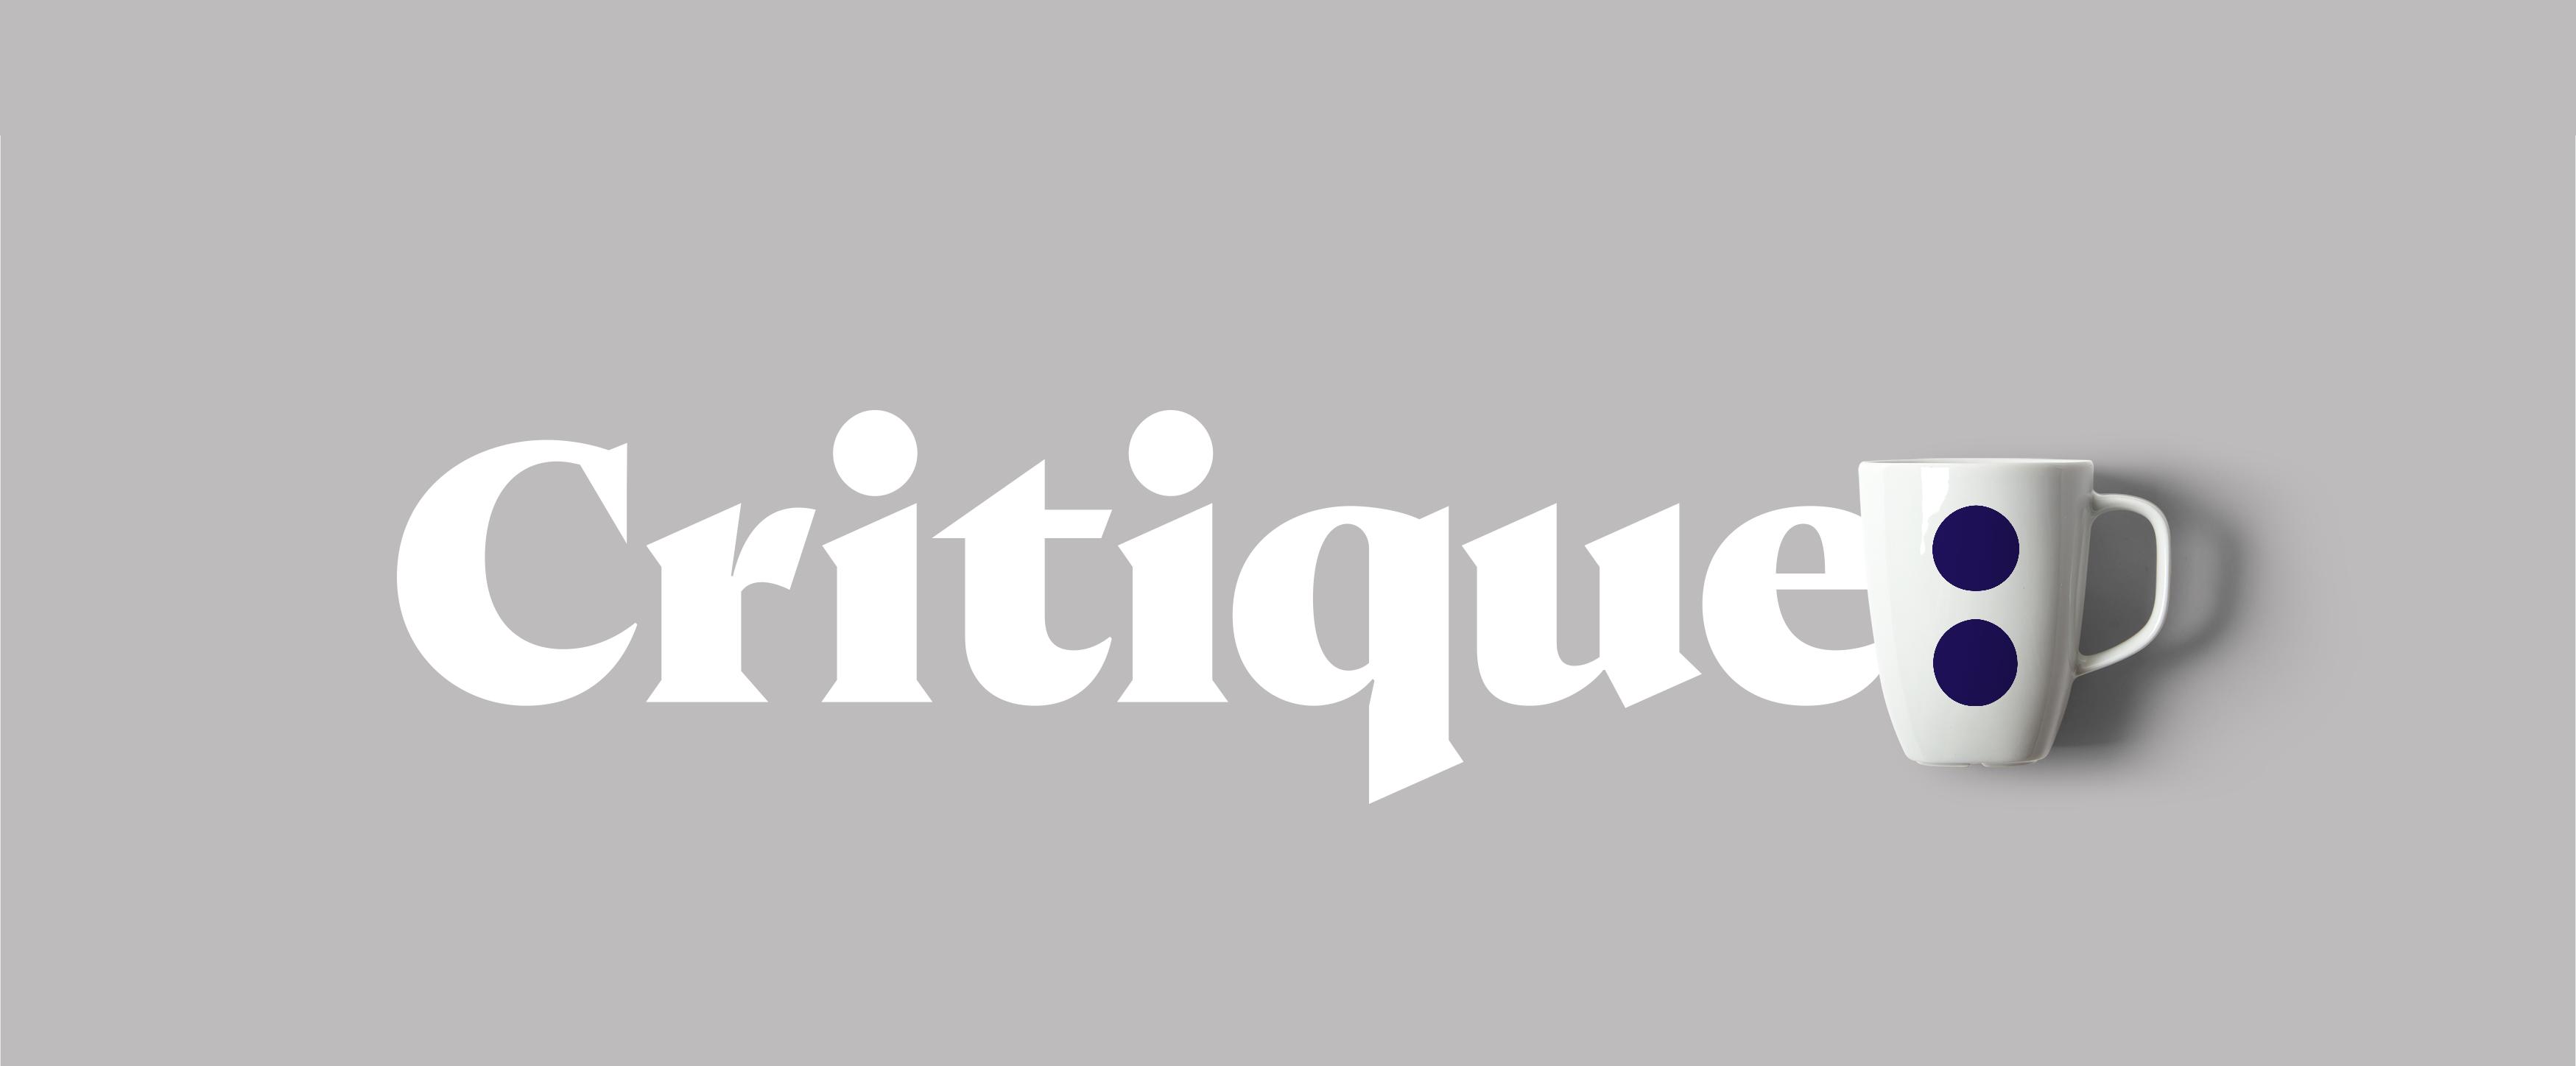 Branding_Critique_02